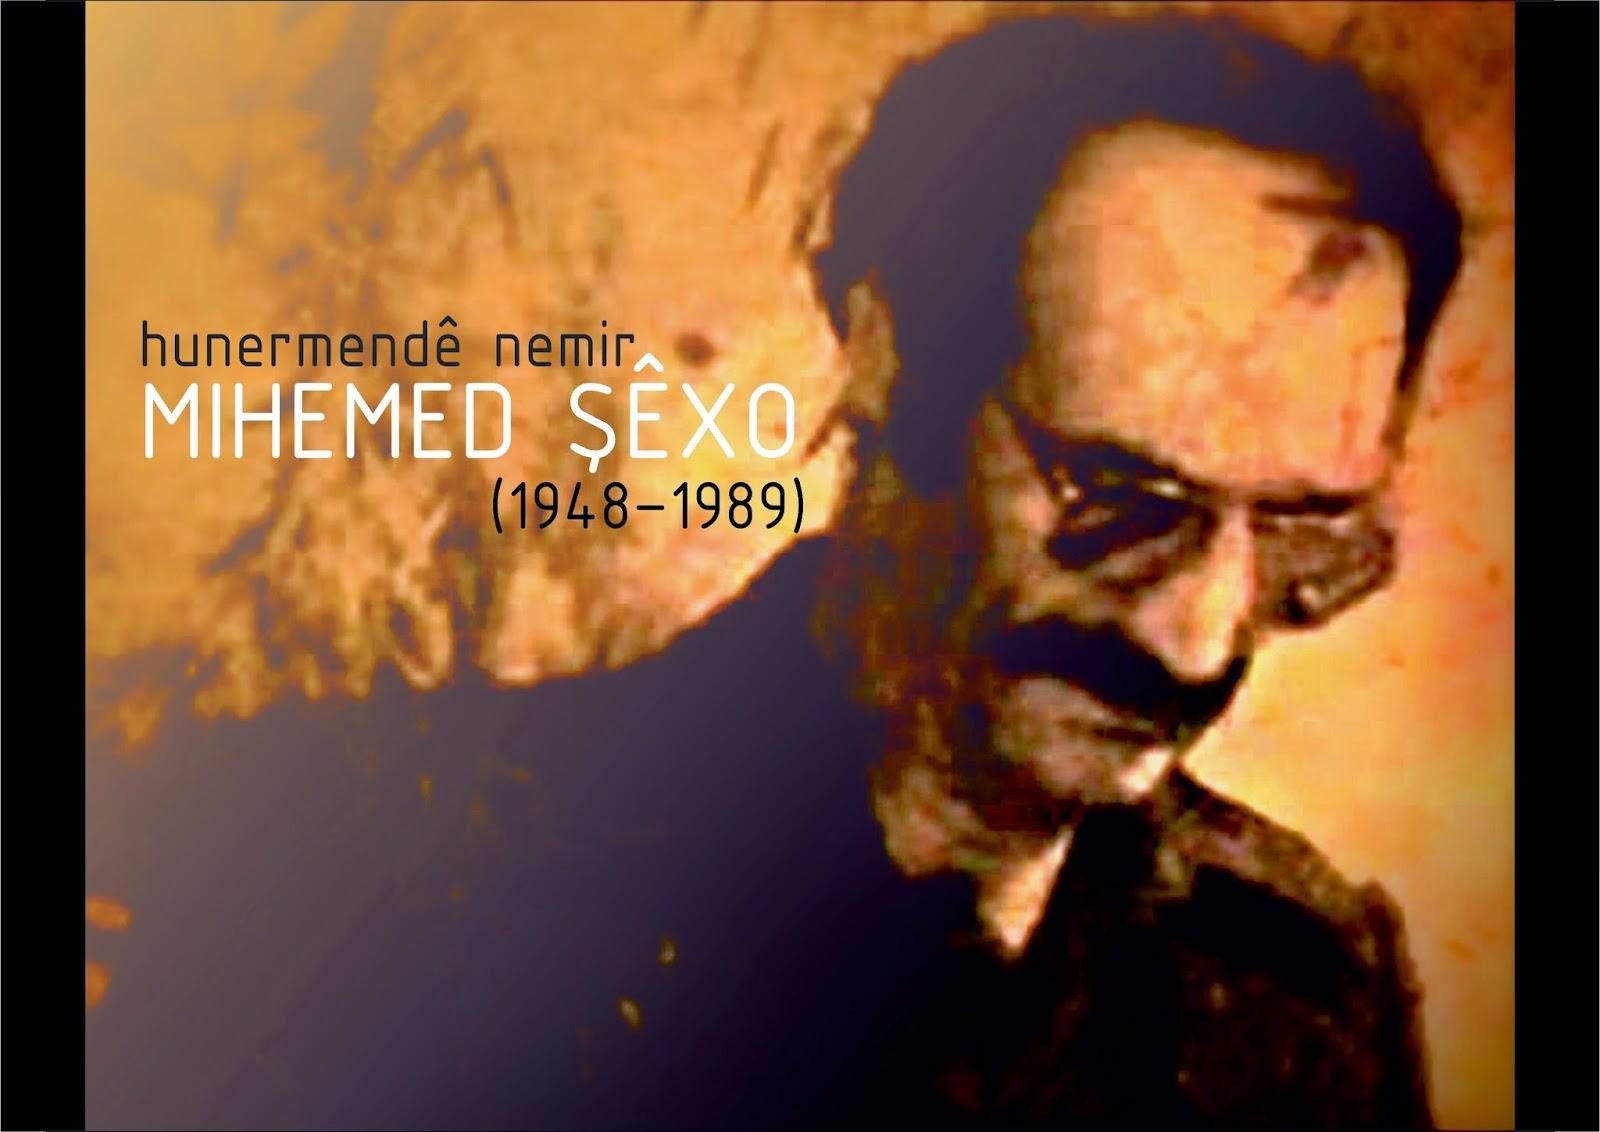 mihemed sexo hayati